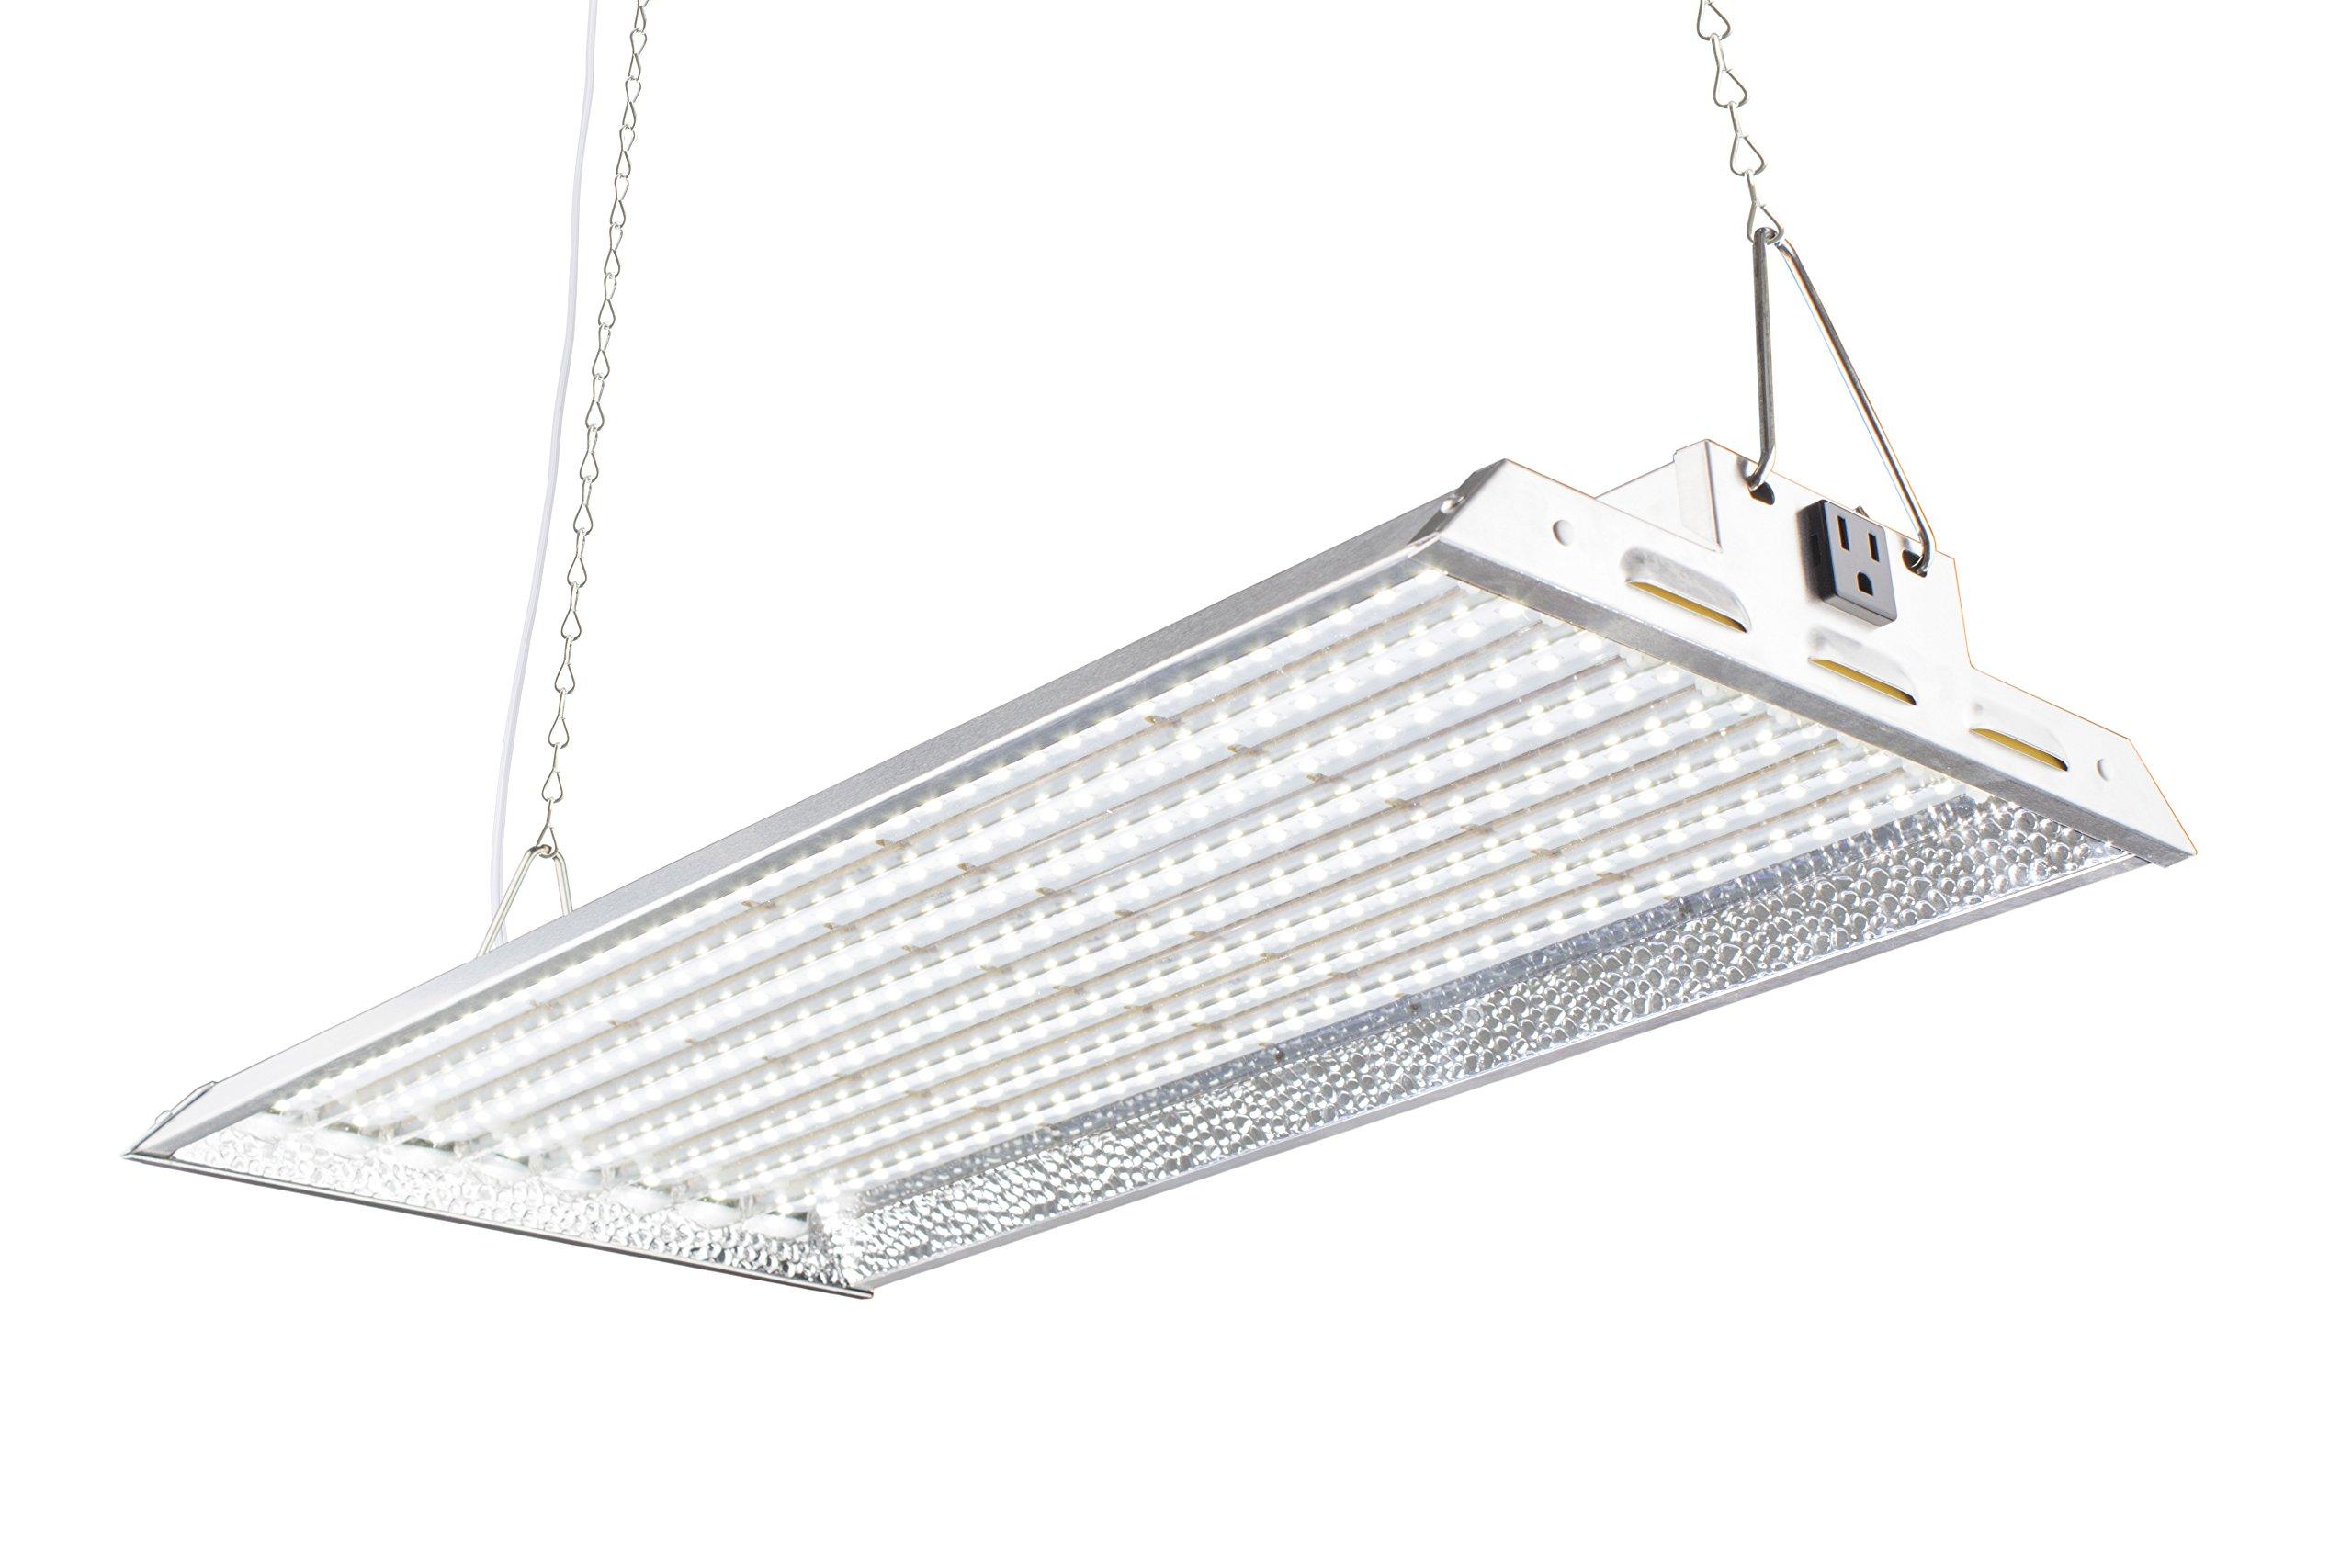 Durolux DLED828W 160W LED Grow Light - Over 50% EnergySaving! (2x1 Foot | 100W, White | FullSun Seed & Veg)